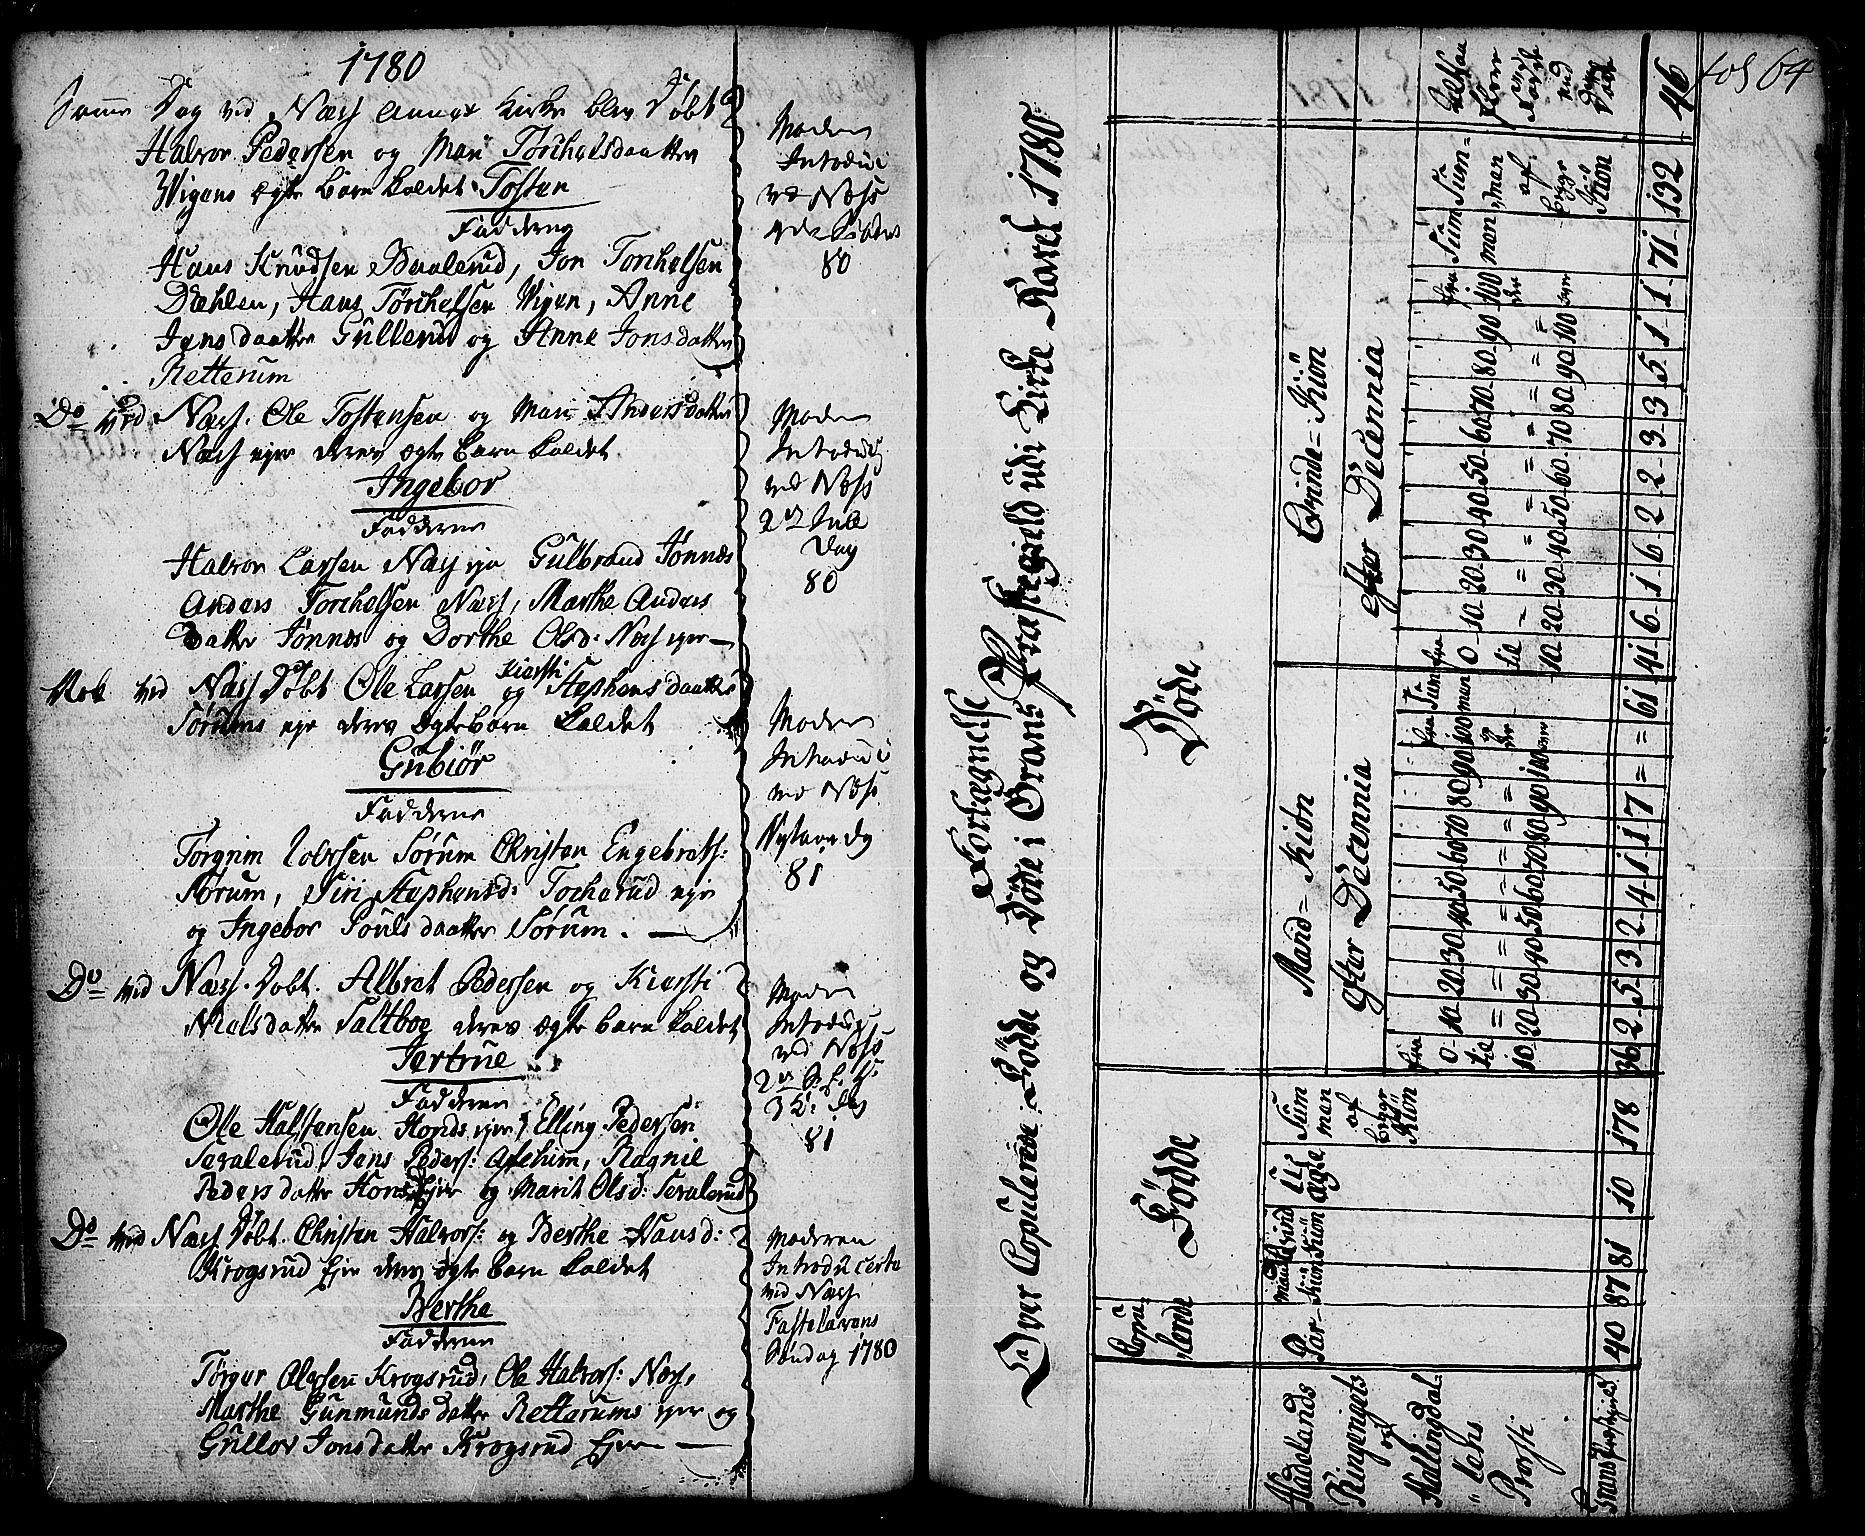 SAH, Gran prestekontor, Ministerialbok nr. 5, 1776-1788, s. 64